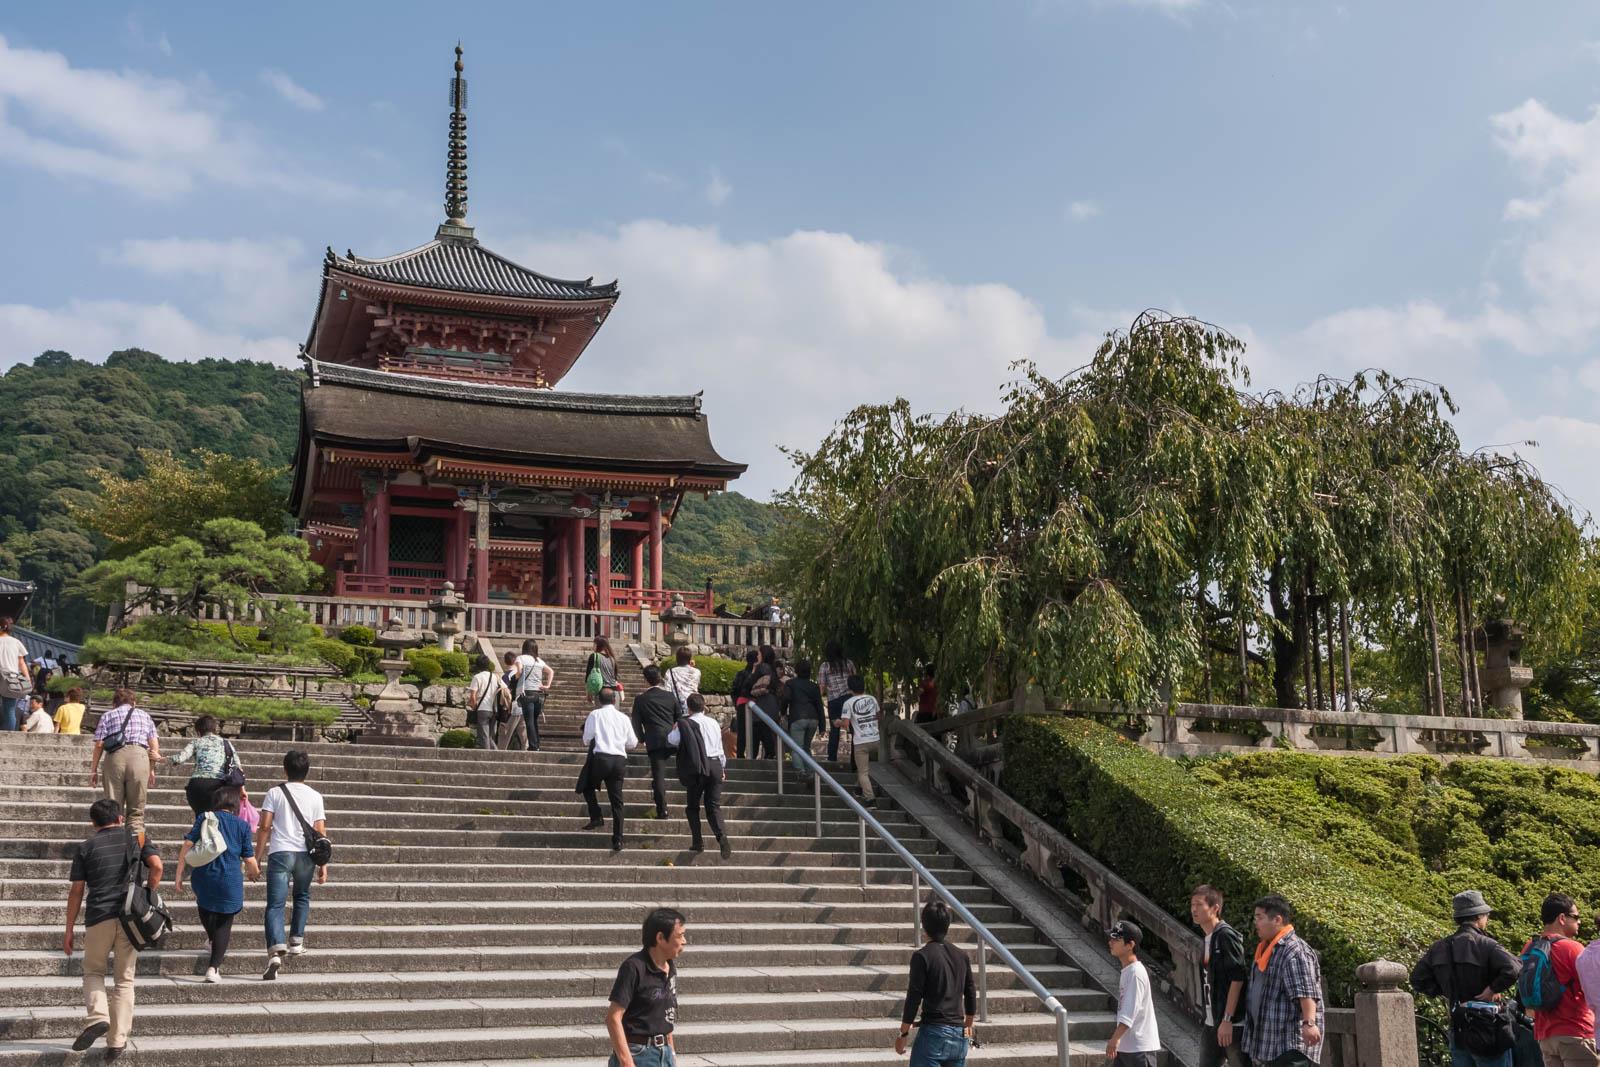 The West Gate of Kiyomizudera